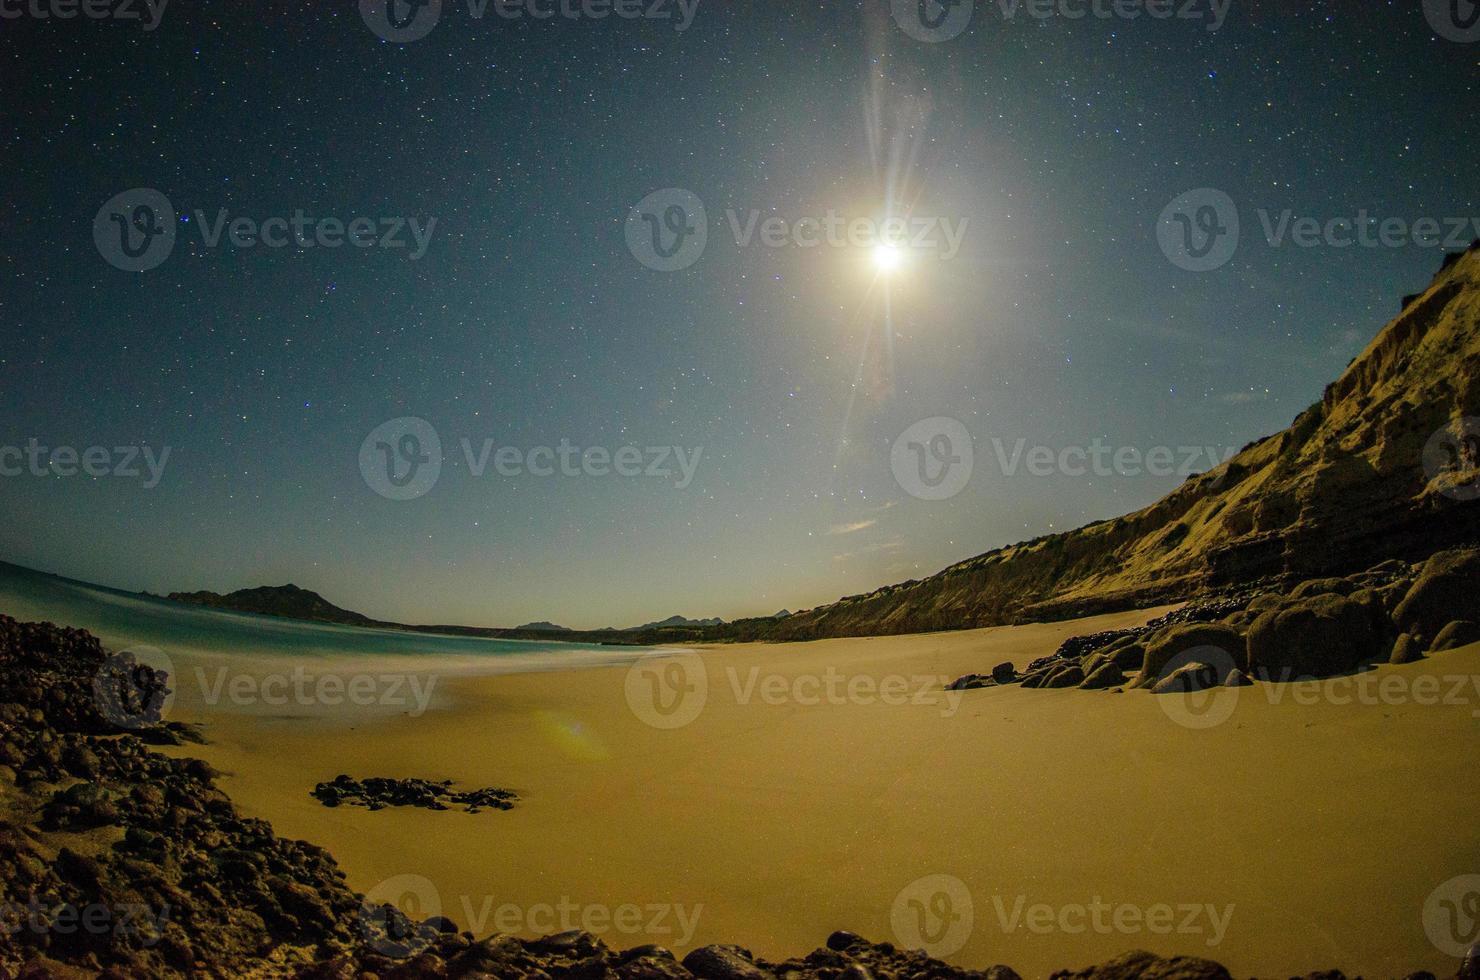 woestijnachtige stranden. foto